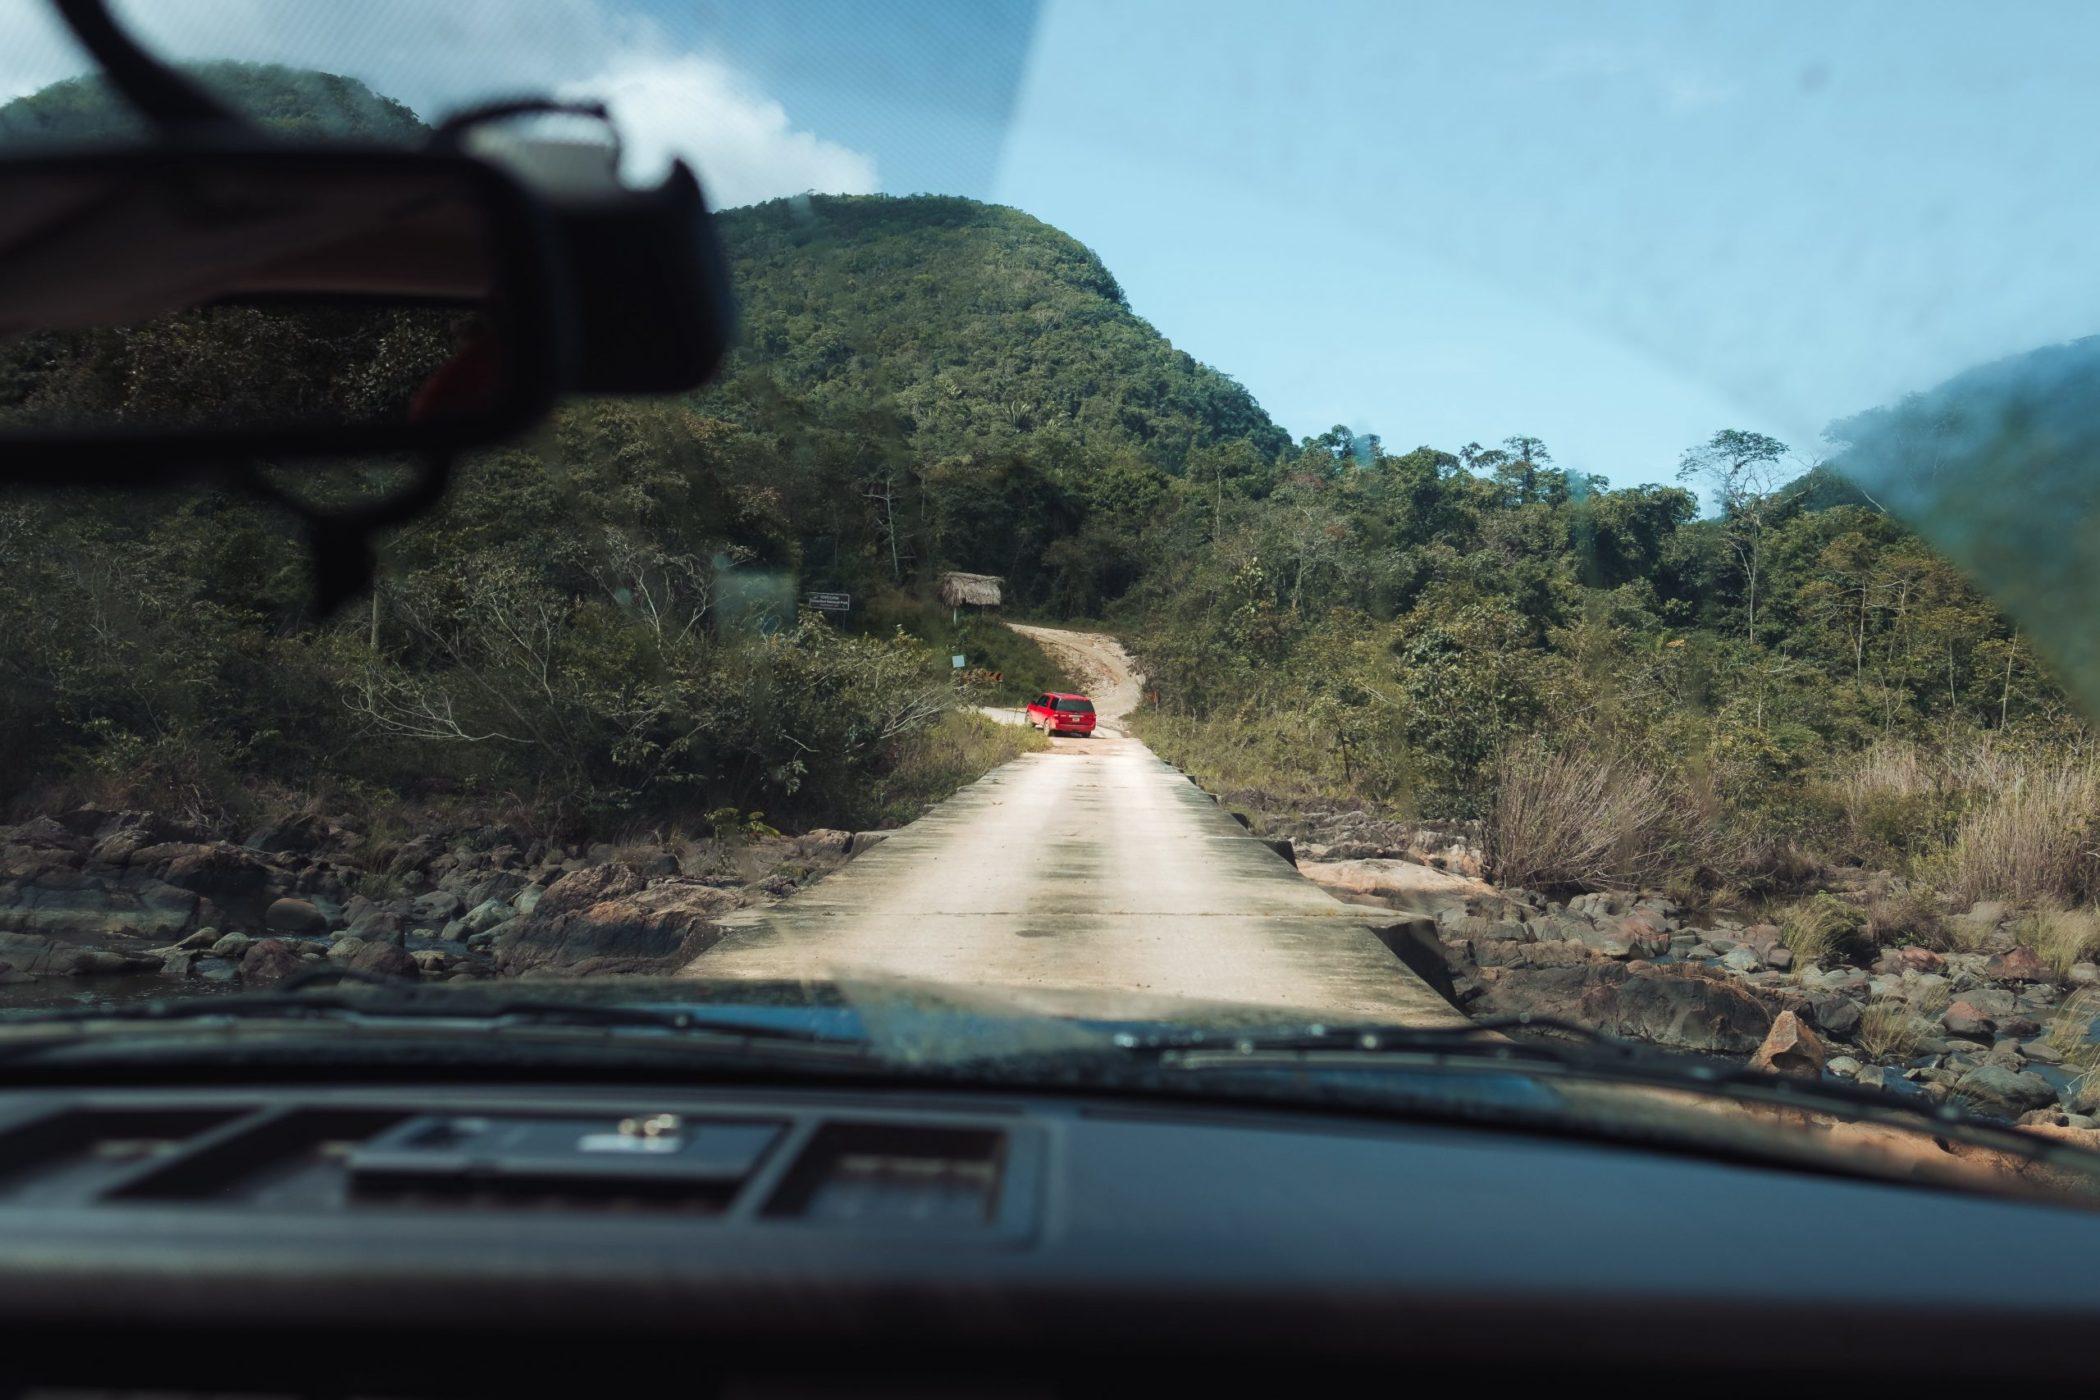 Driving through the Mountain Pine Ridge in Belize